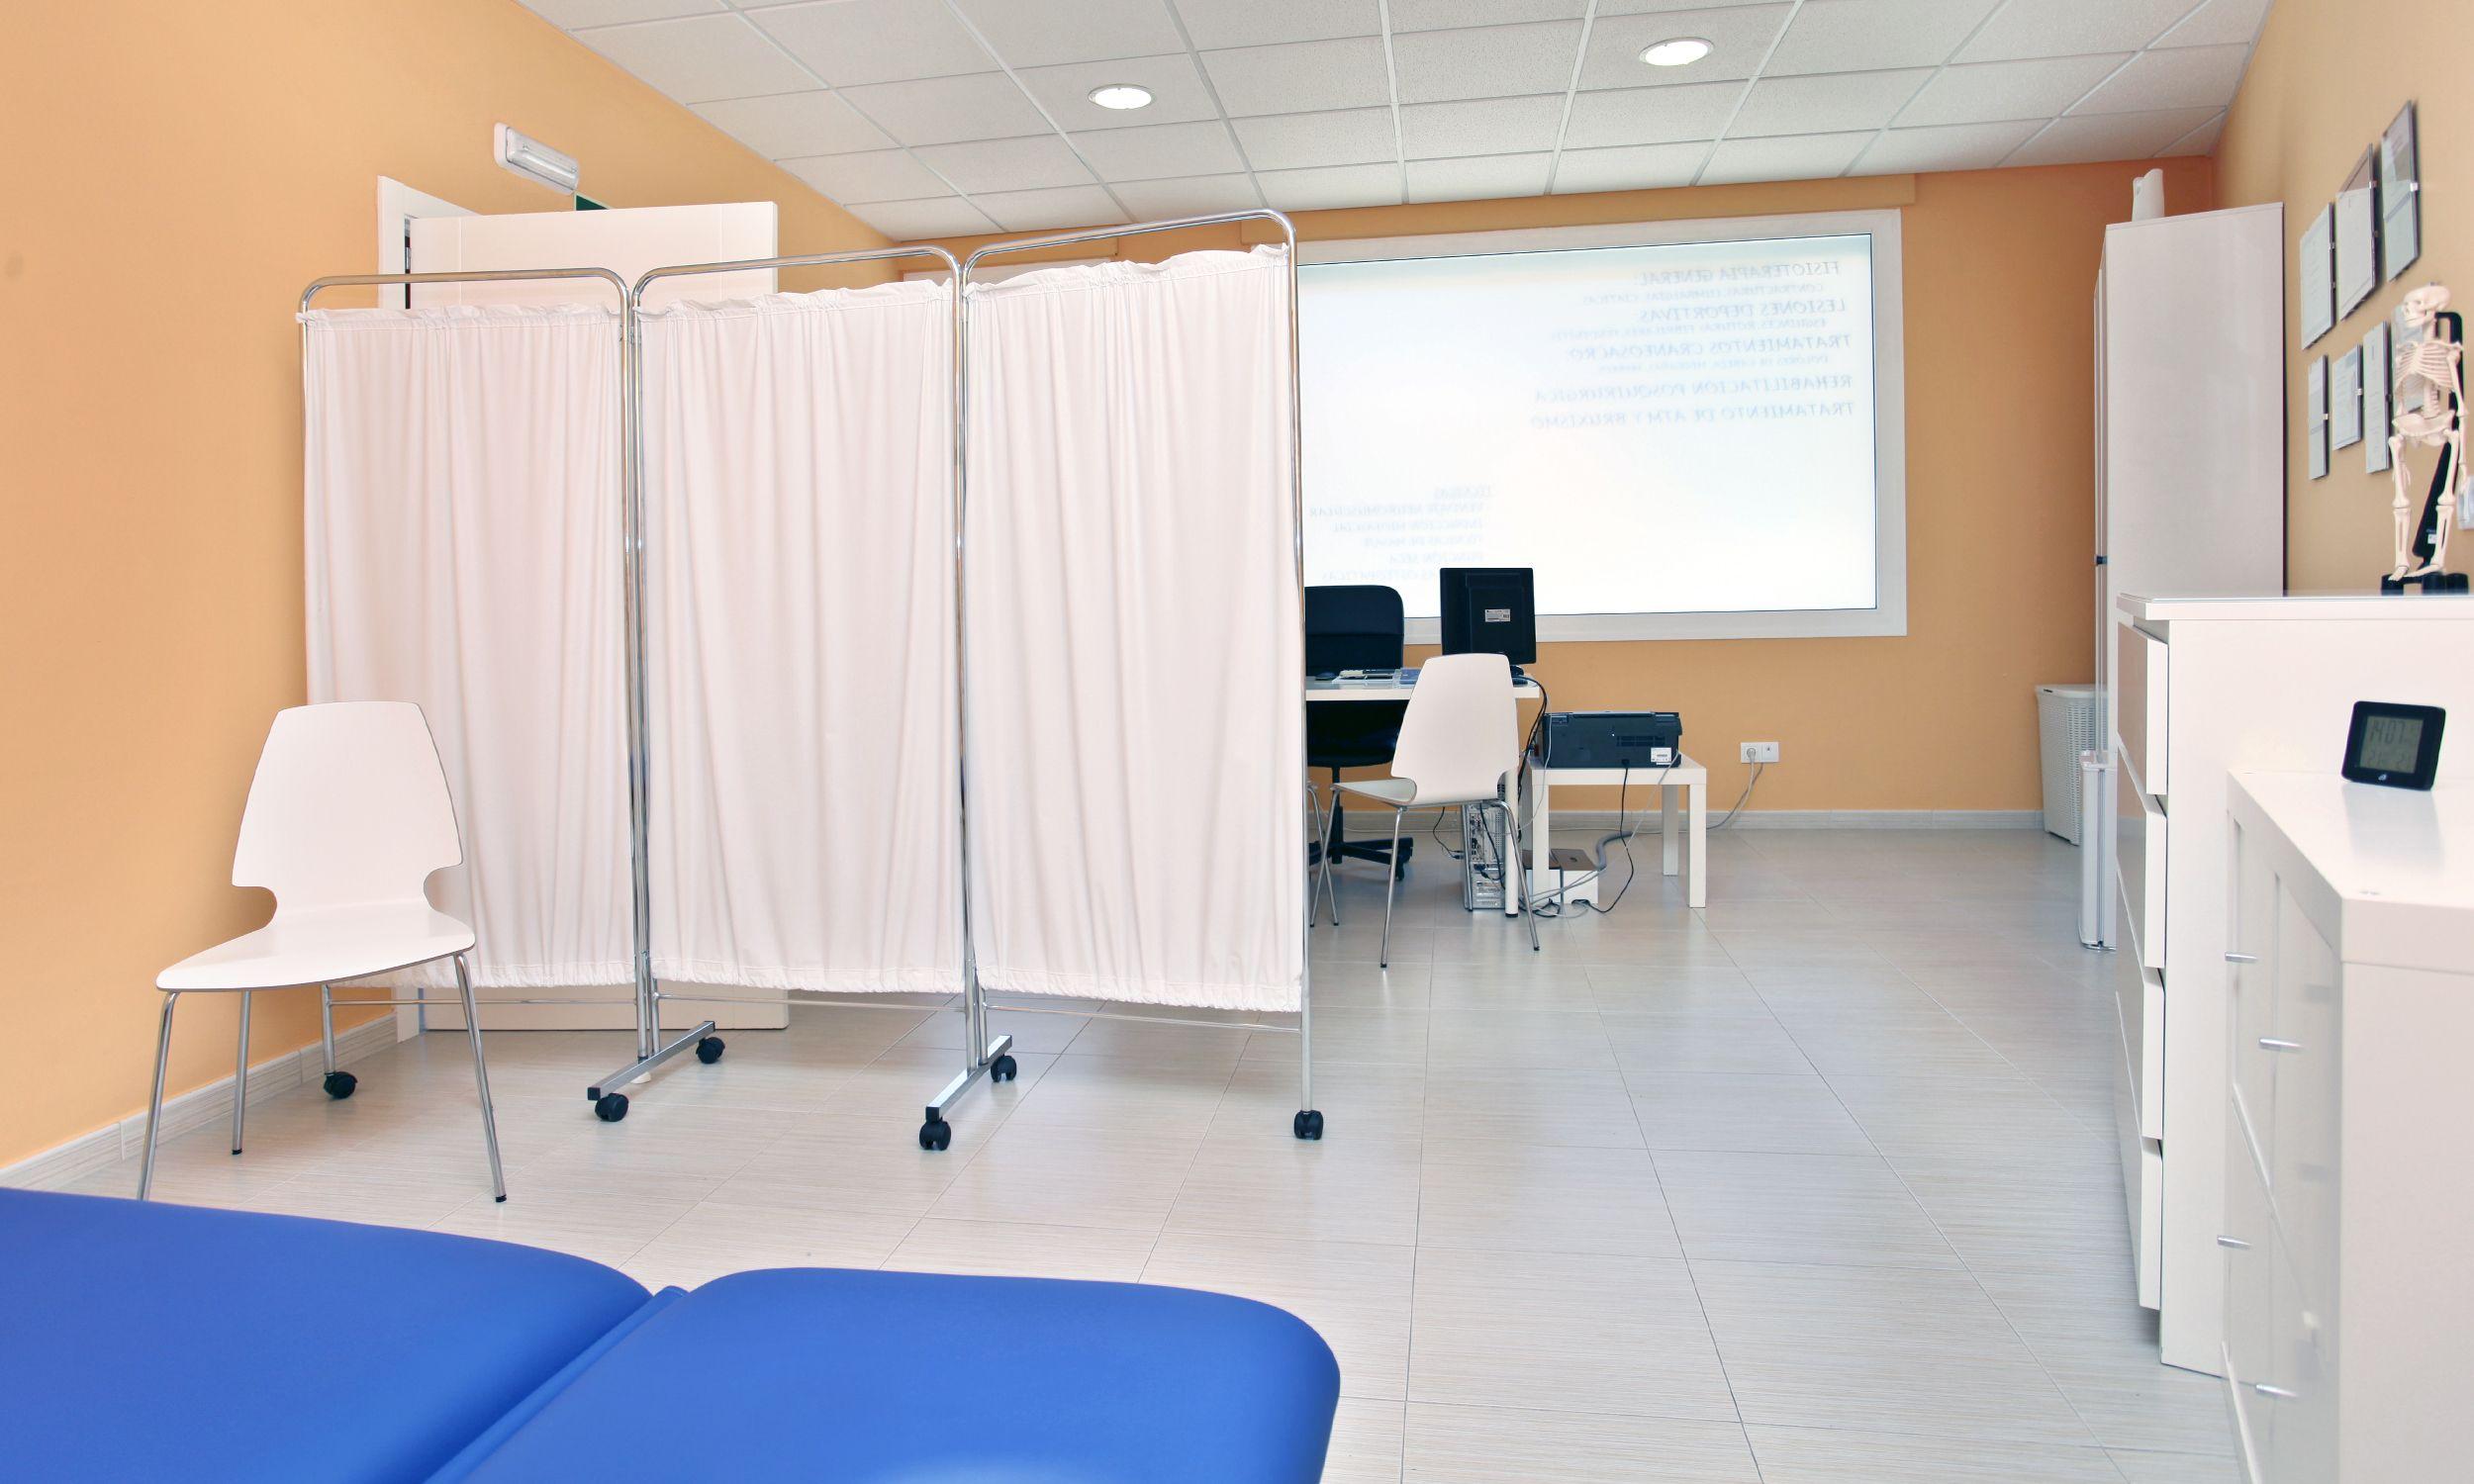 Fisioterapia postural en Madridejos